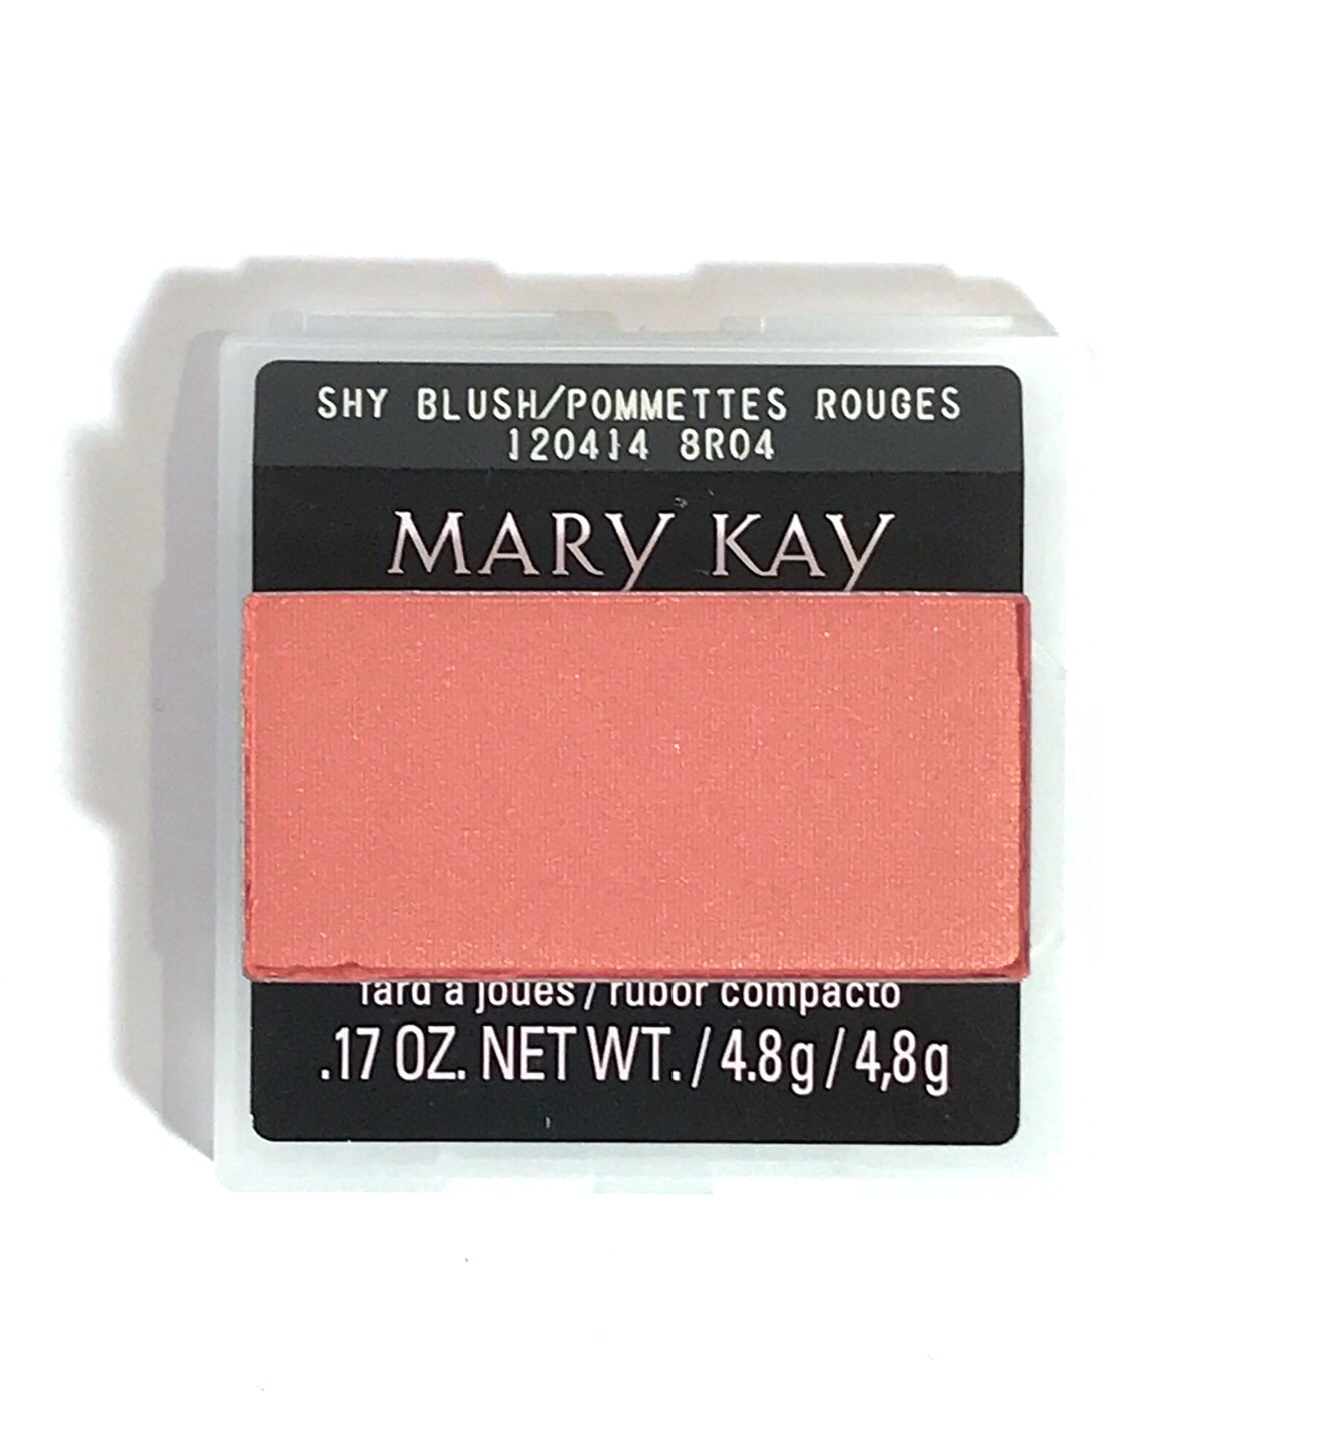 MARY KAY CHROMAFUSION BLUSH~YOU CHOOSE CHEEK COLOR~SHY